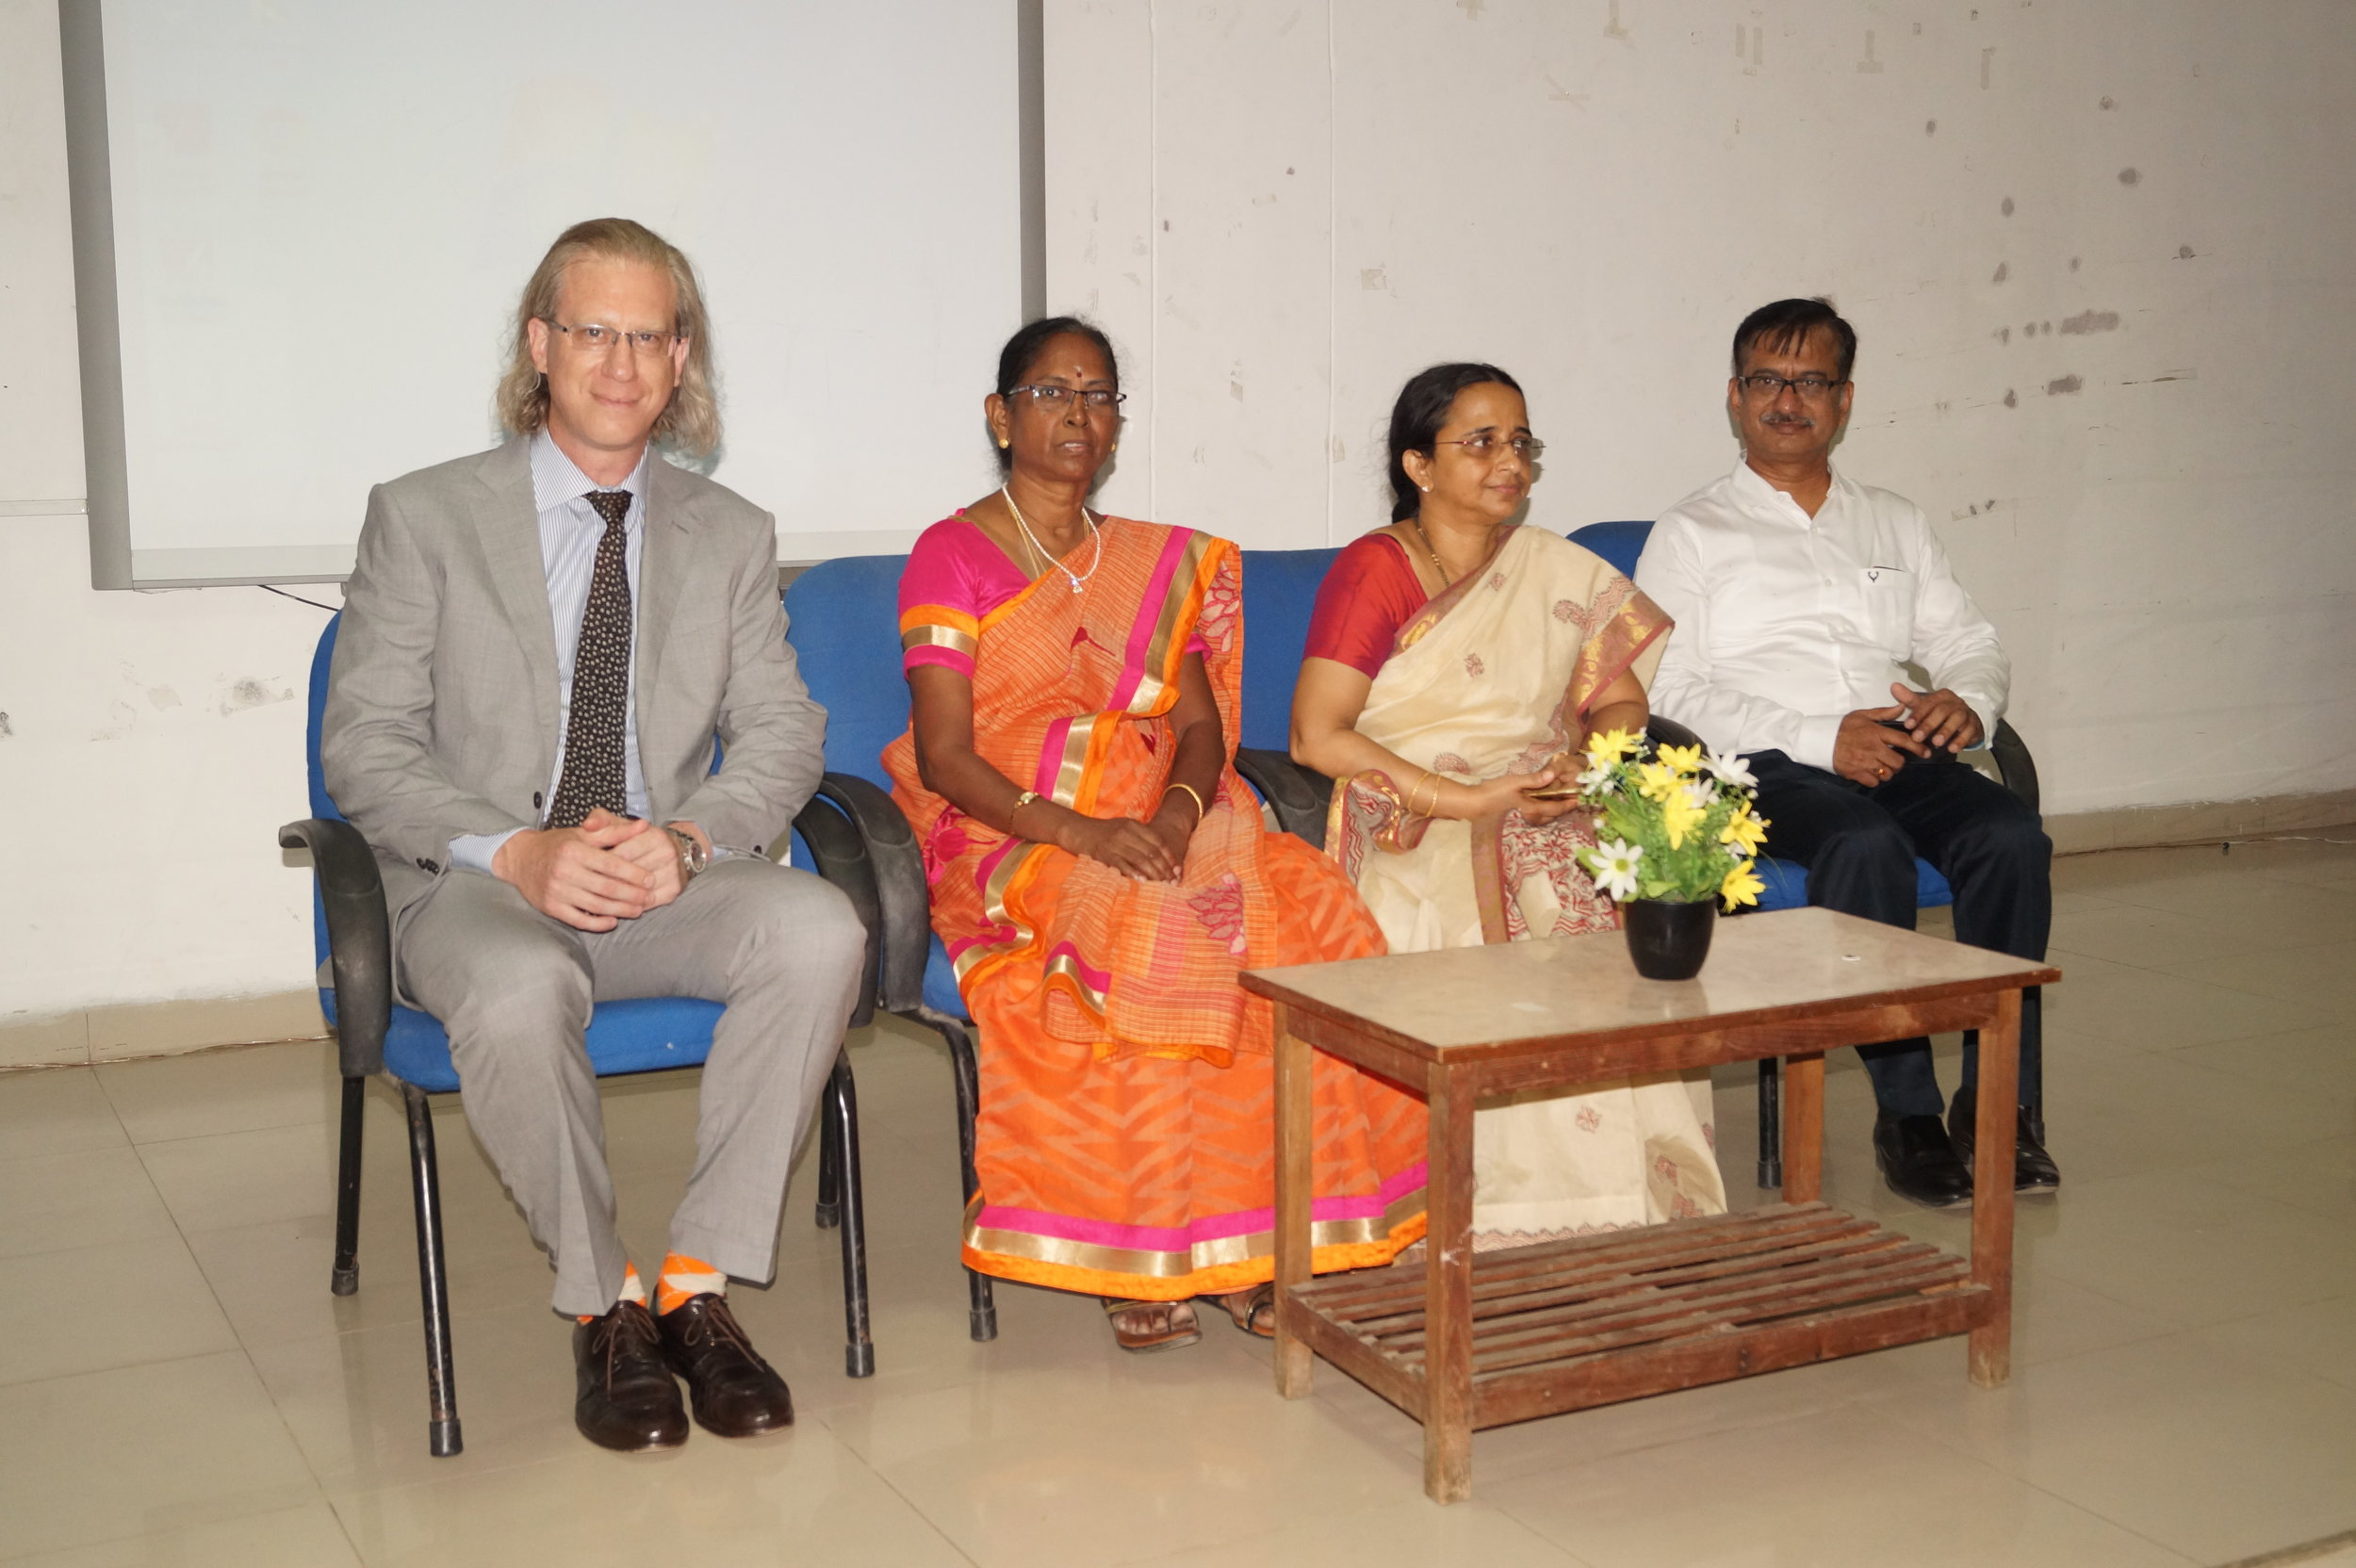 http://sdc saveetha com/news — Saveetha Dental College